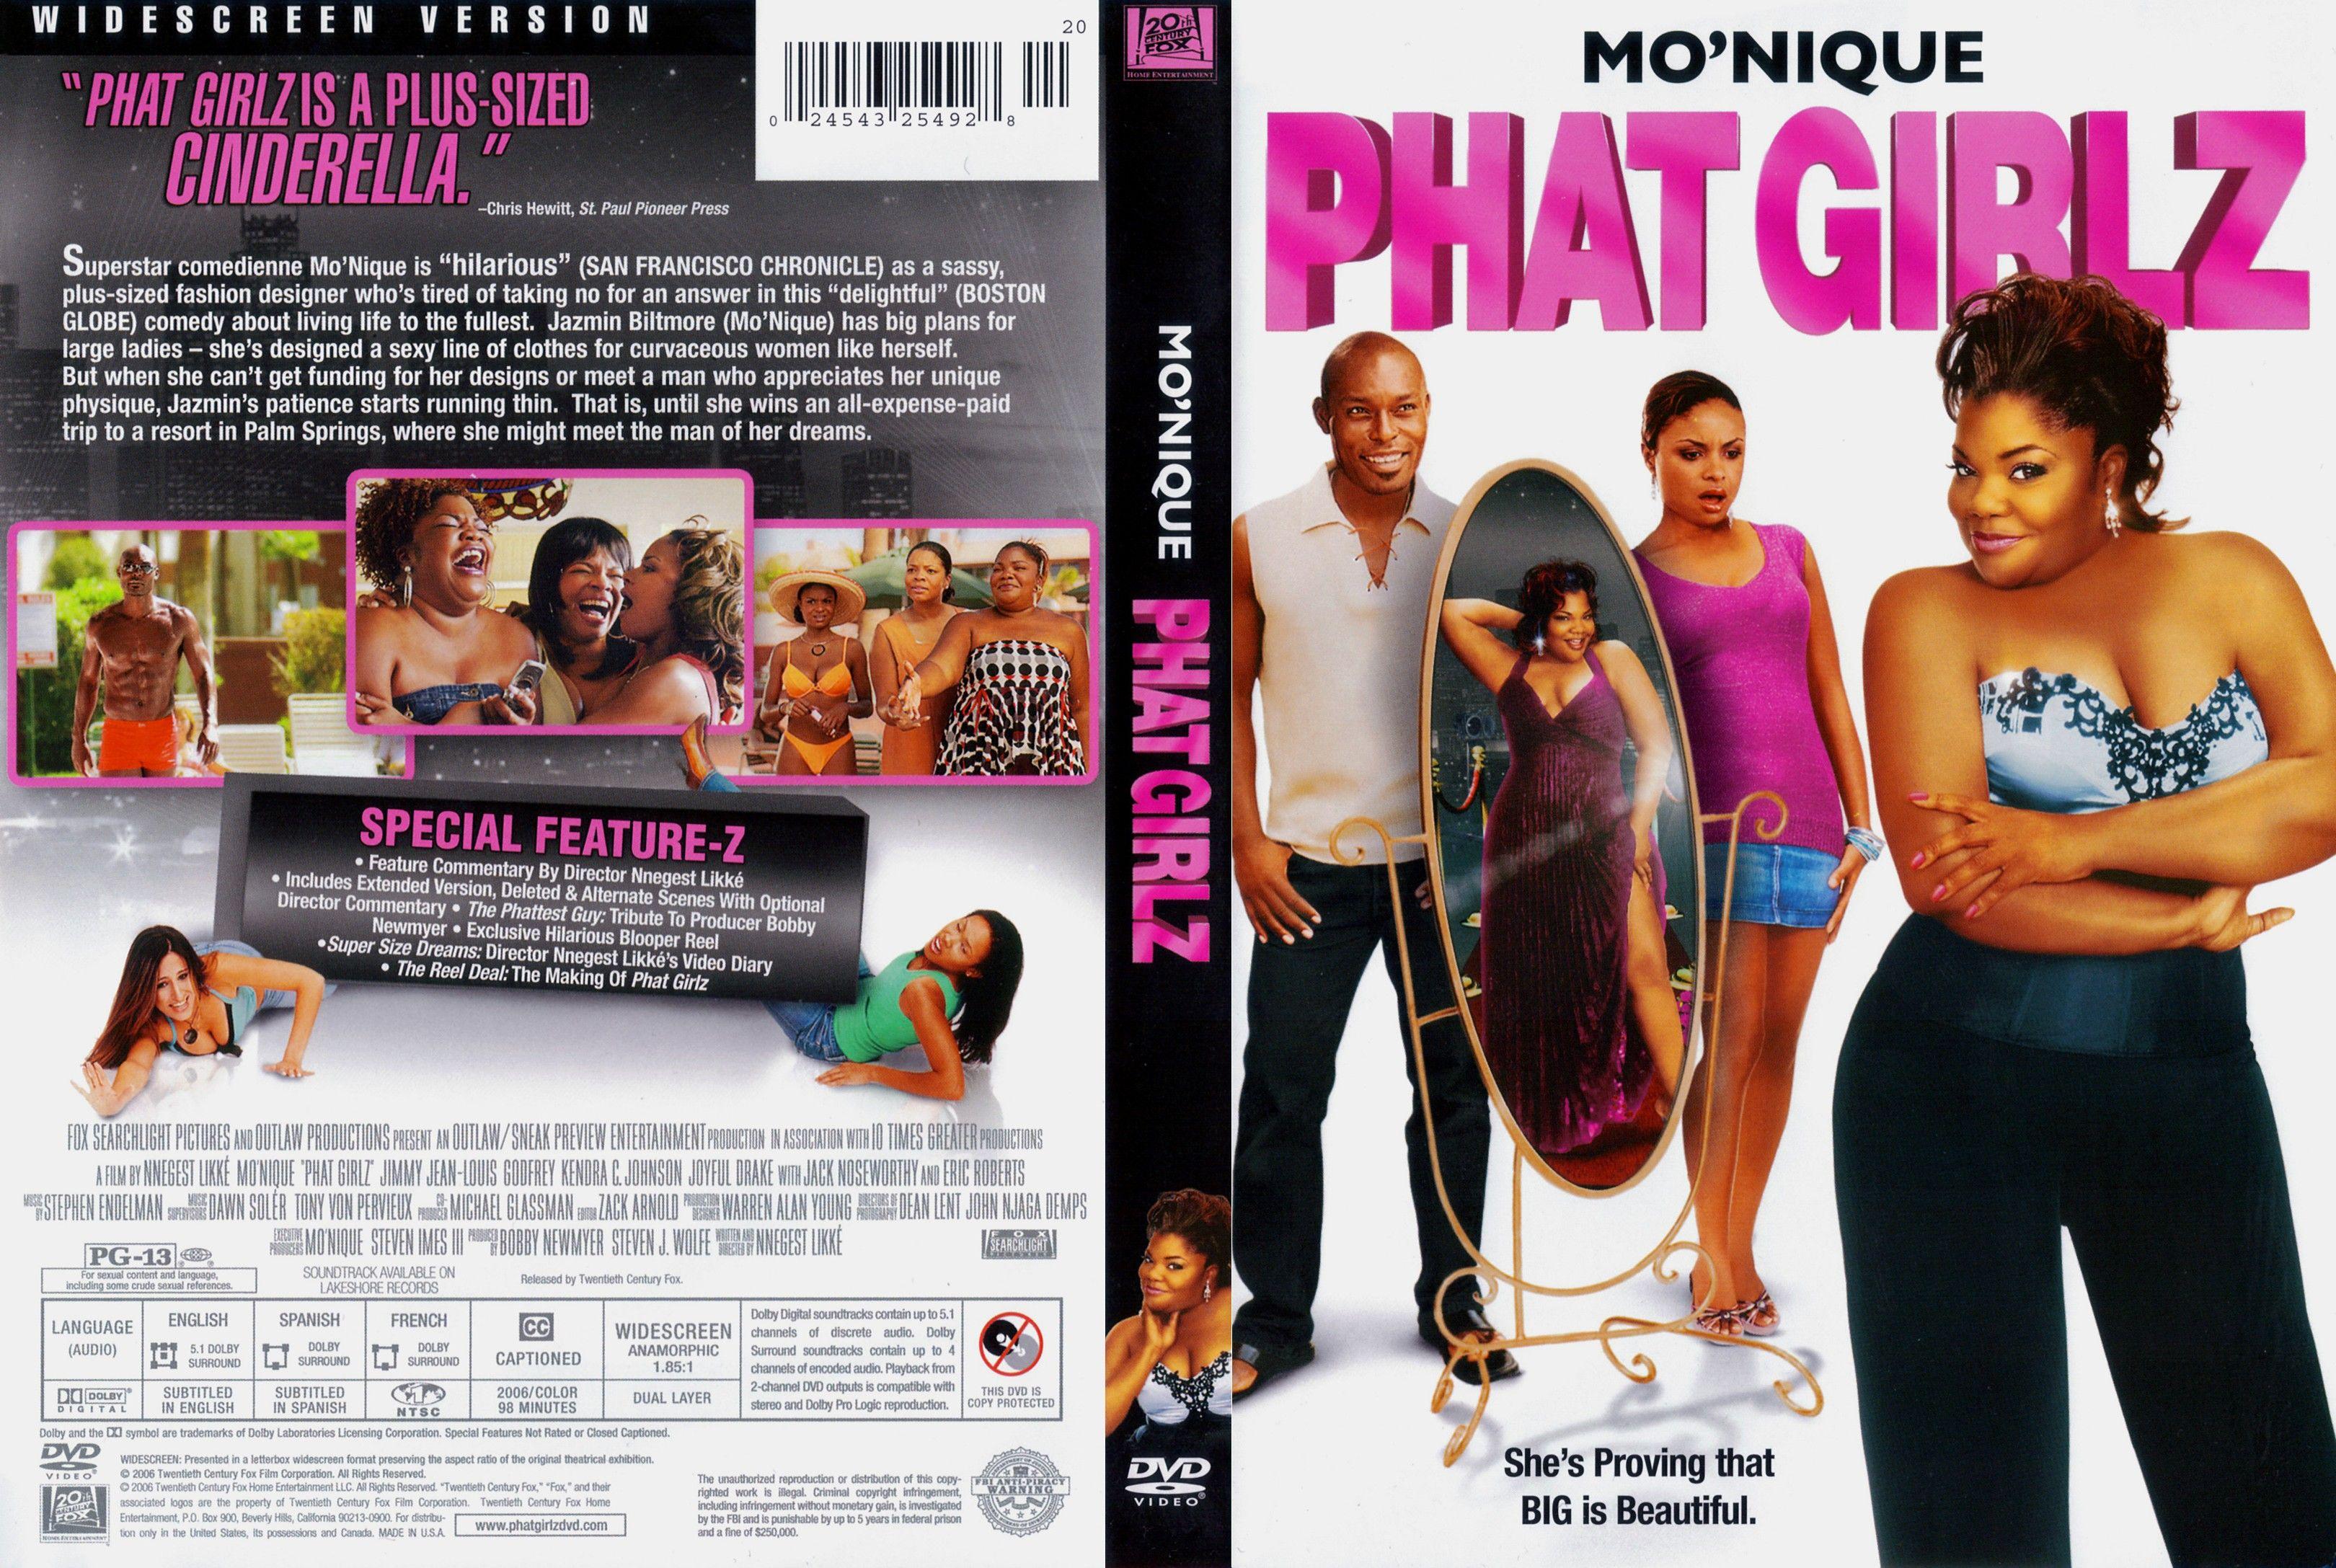 Phat Girlz[2006][DVDRip][AC 3 5 1] 3L3uth3ri0S preview 6